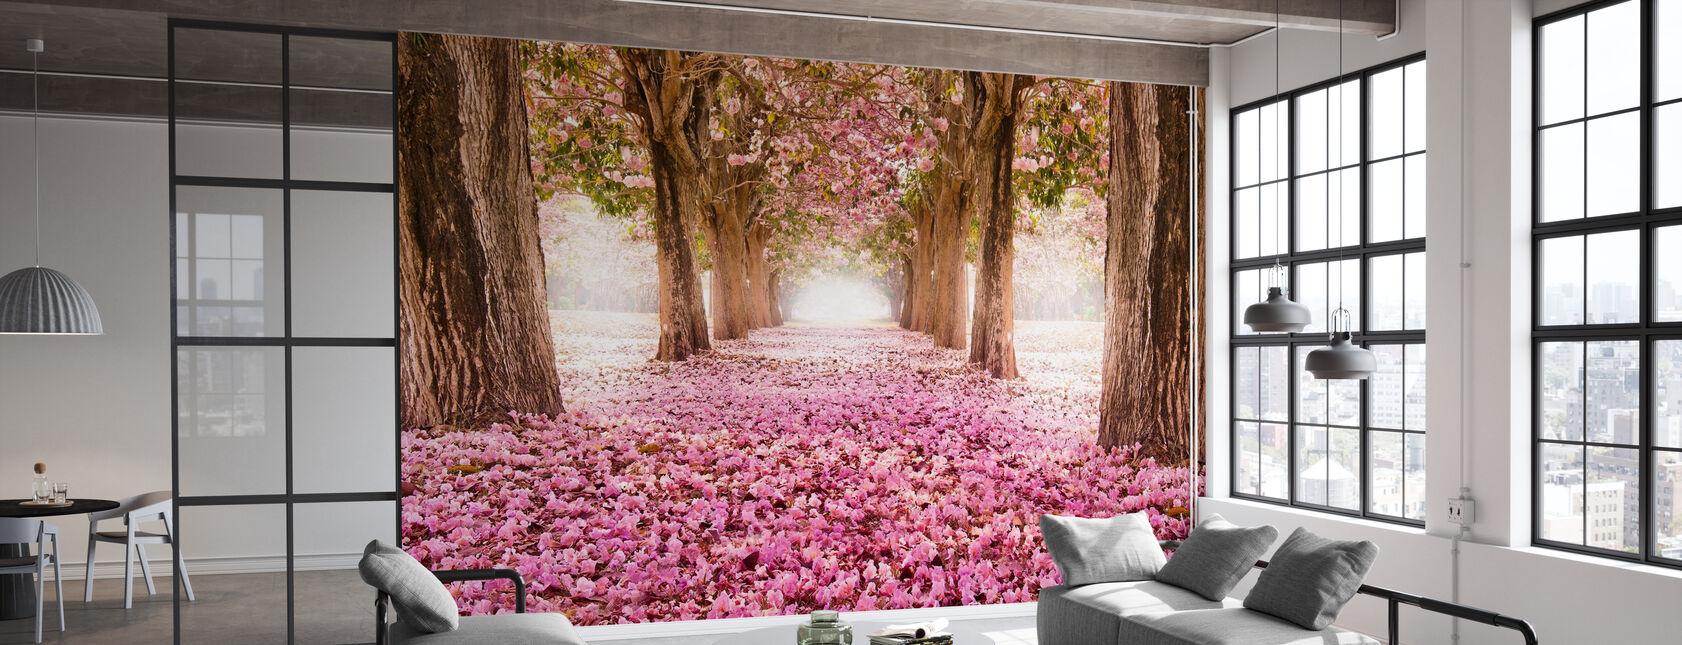 Romantic Tunnel - Wallpaper - Office